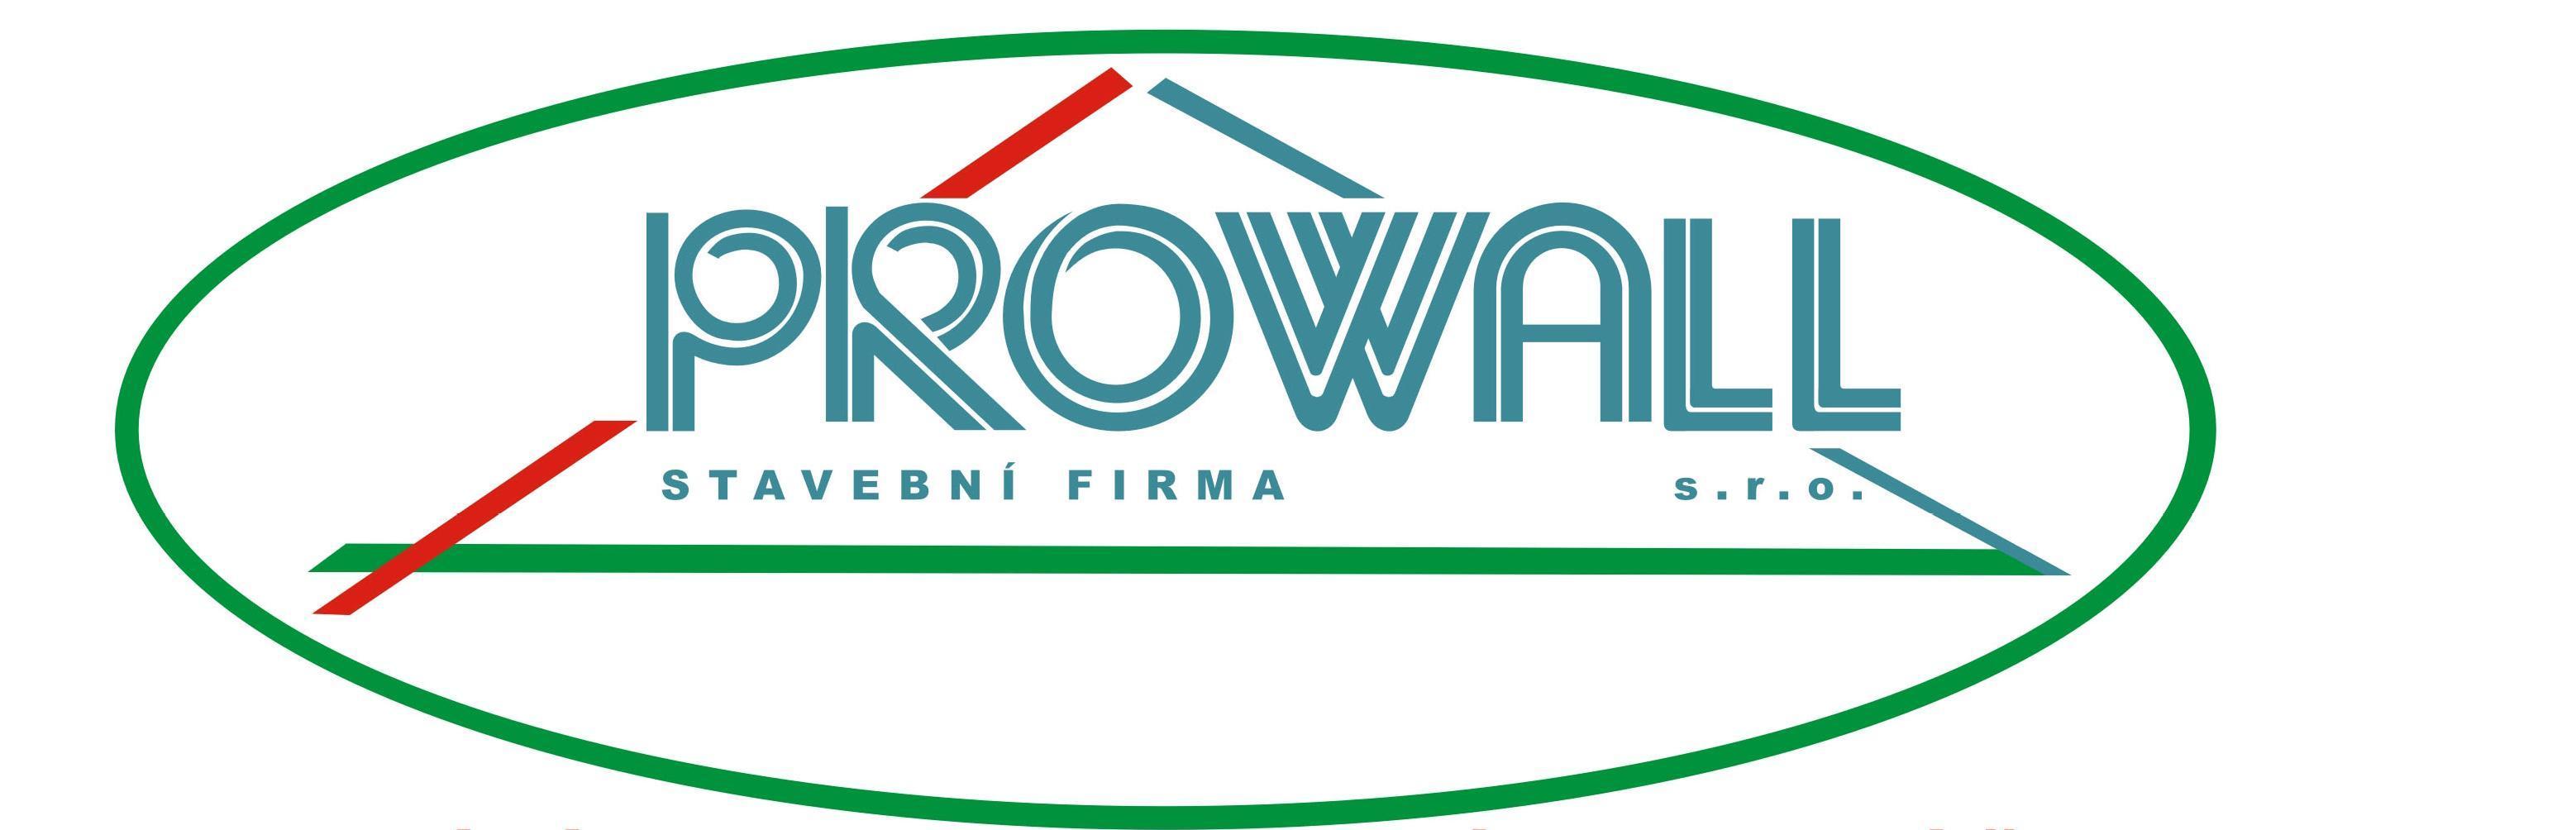 Prowall, s.r.o.